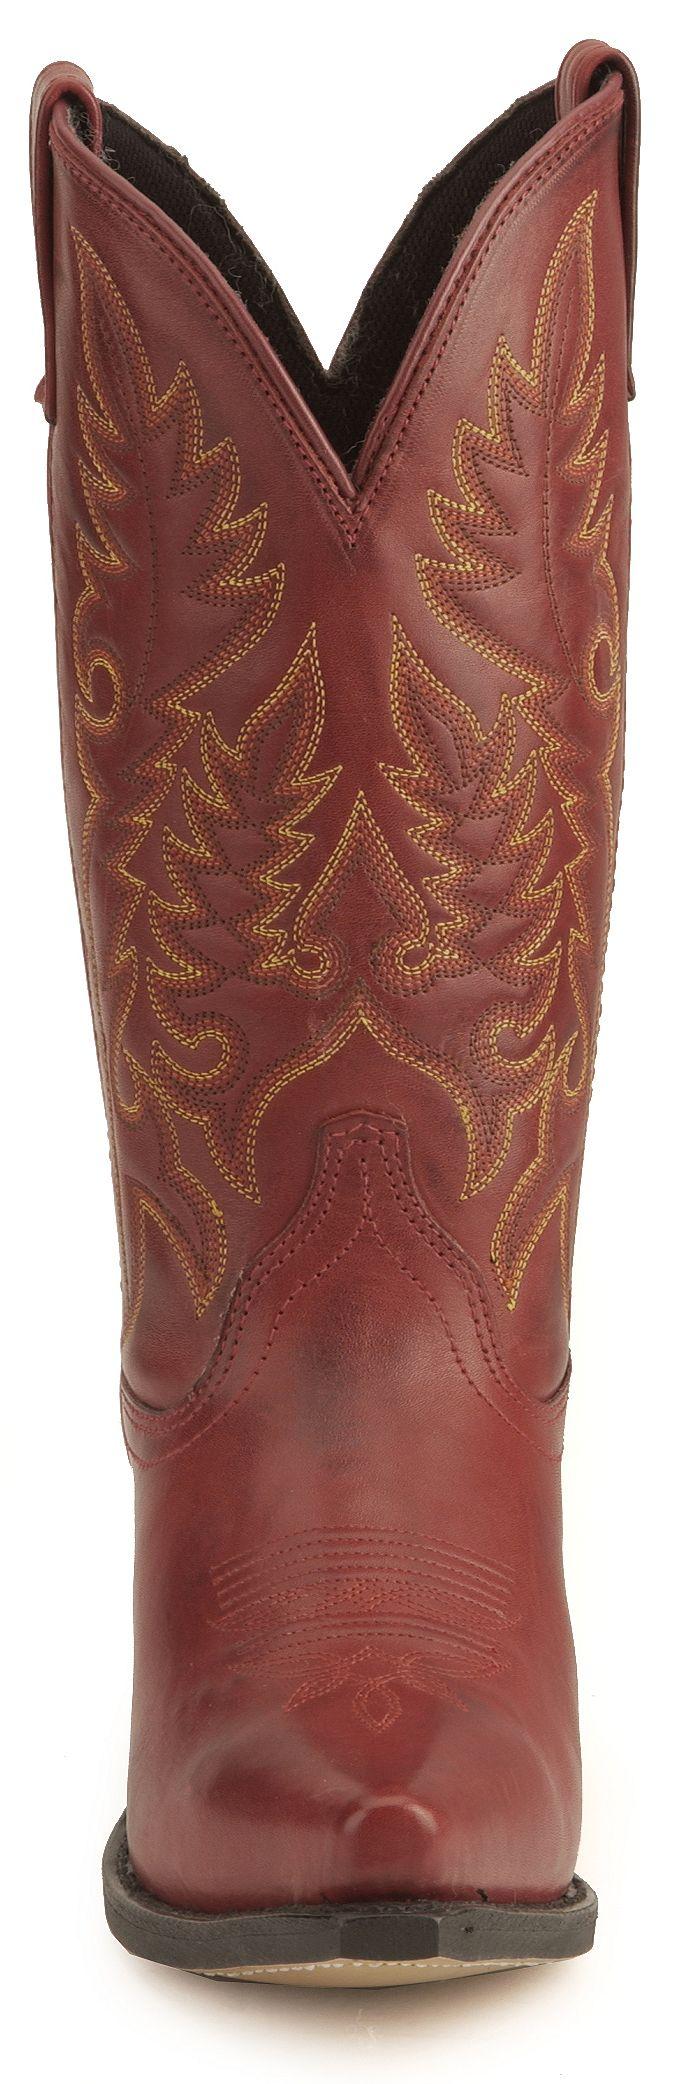 Laredo High Heel Red Cowgirl Boots - Snip Toe | Sheplers